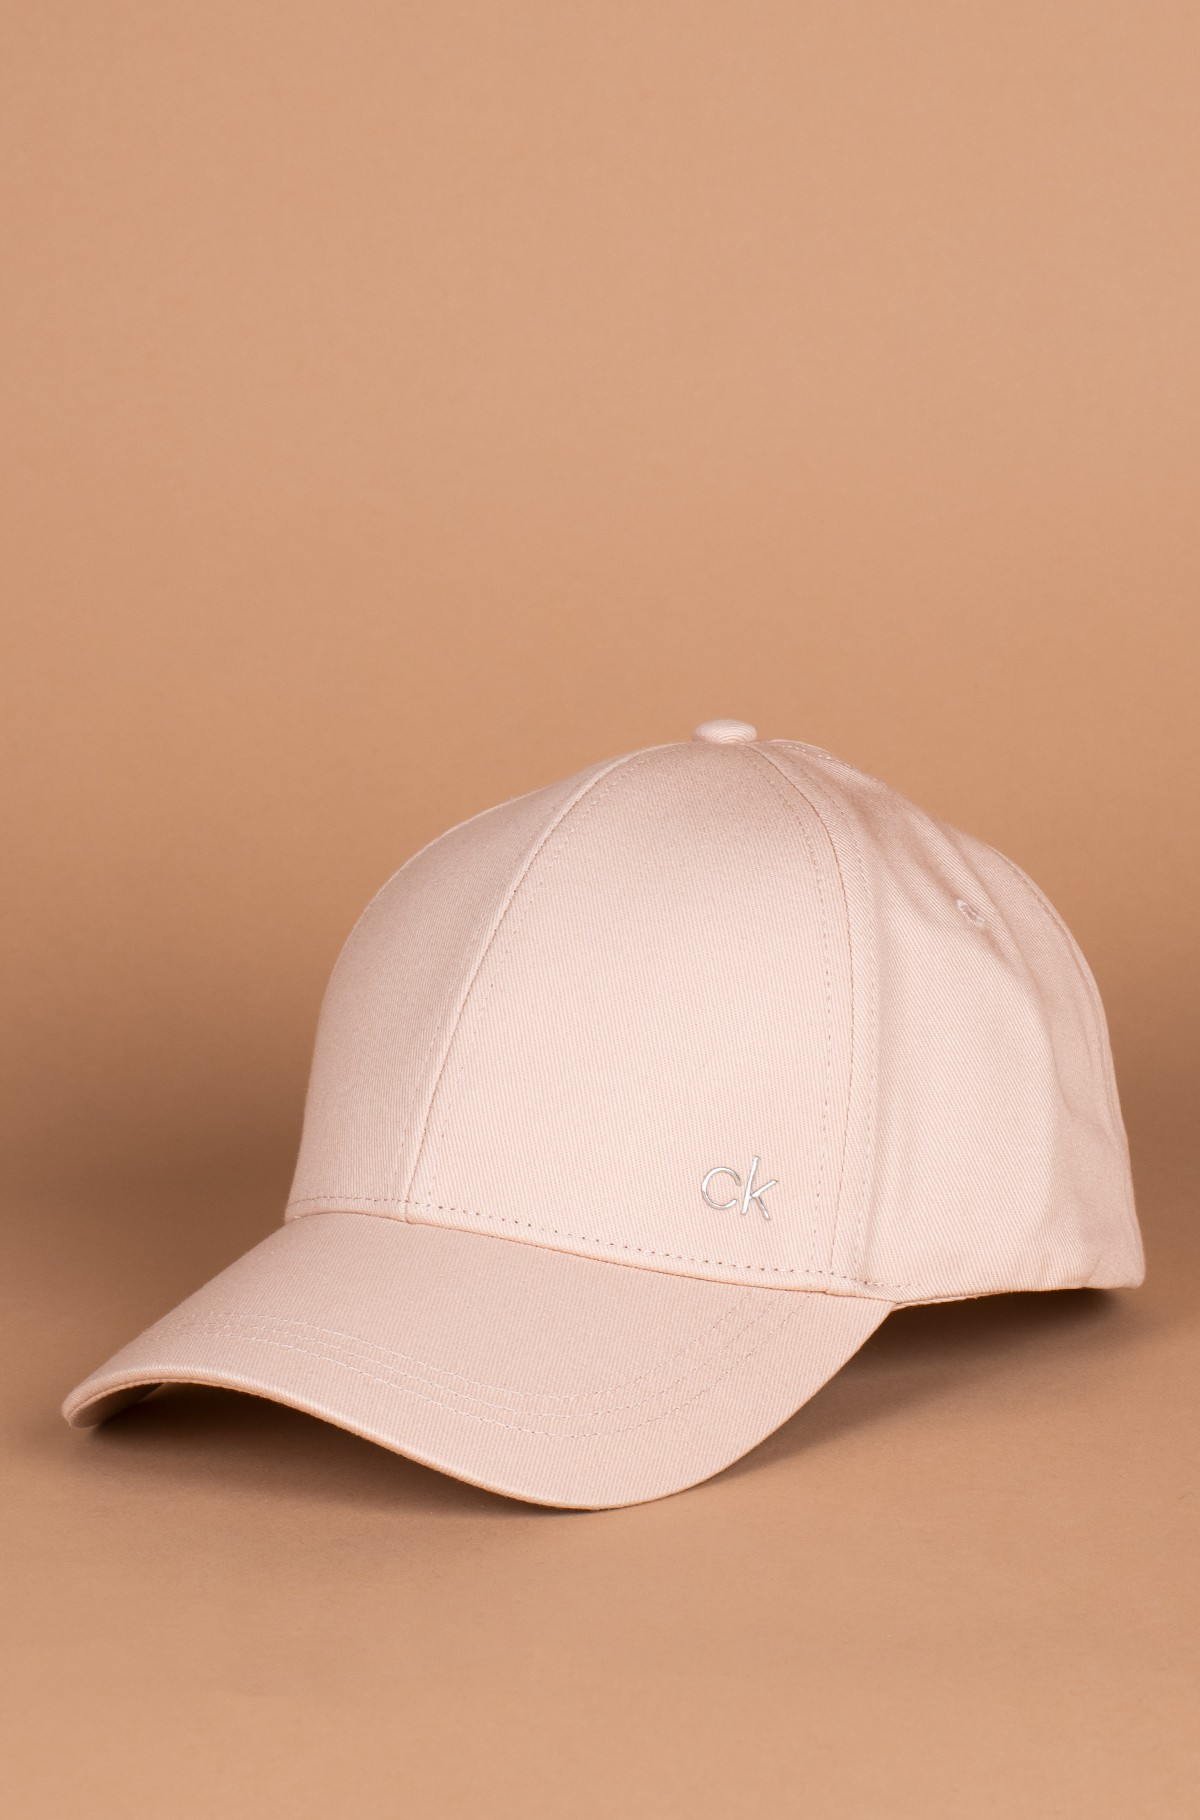 Cepure ar nagu CK METAL CAP-full-1